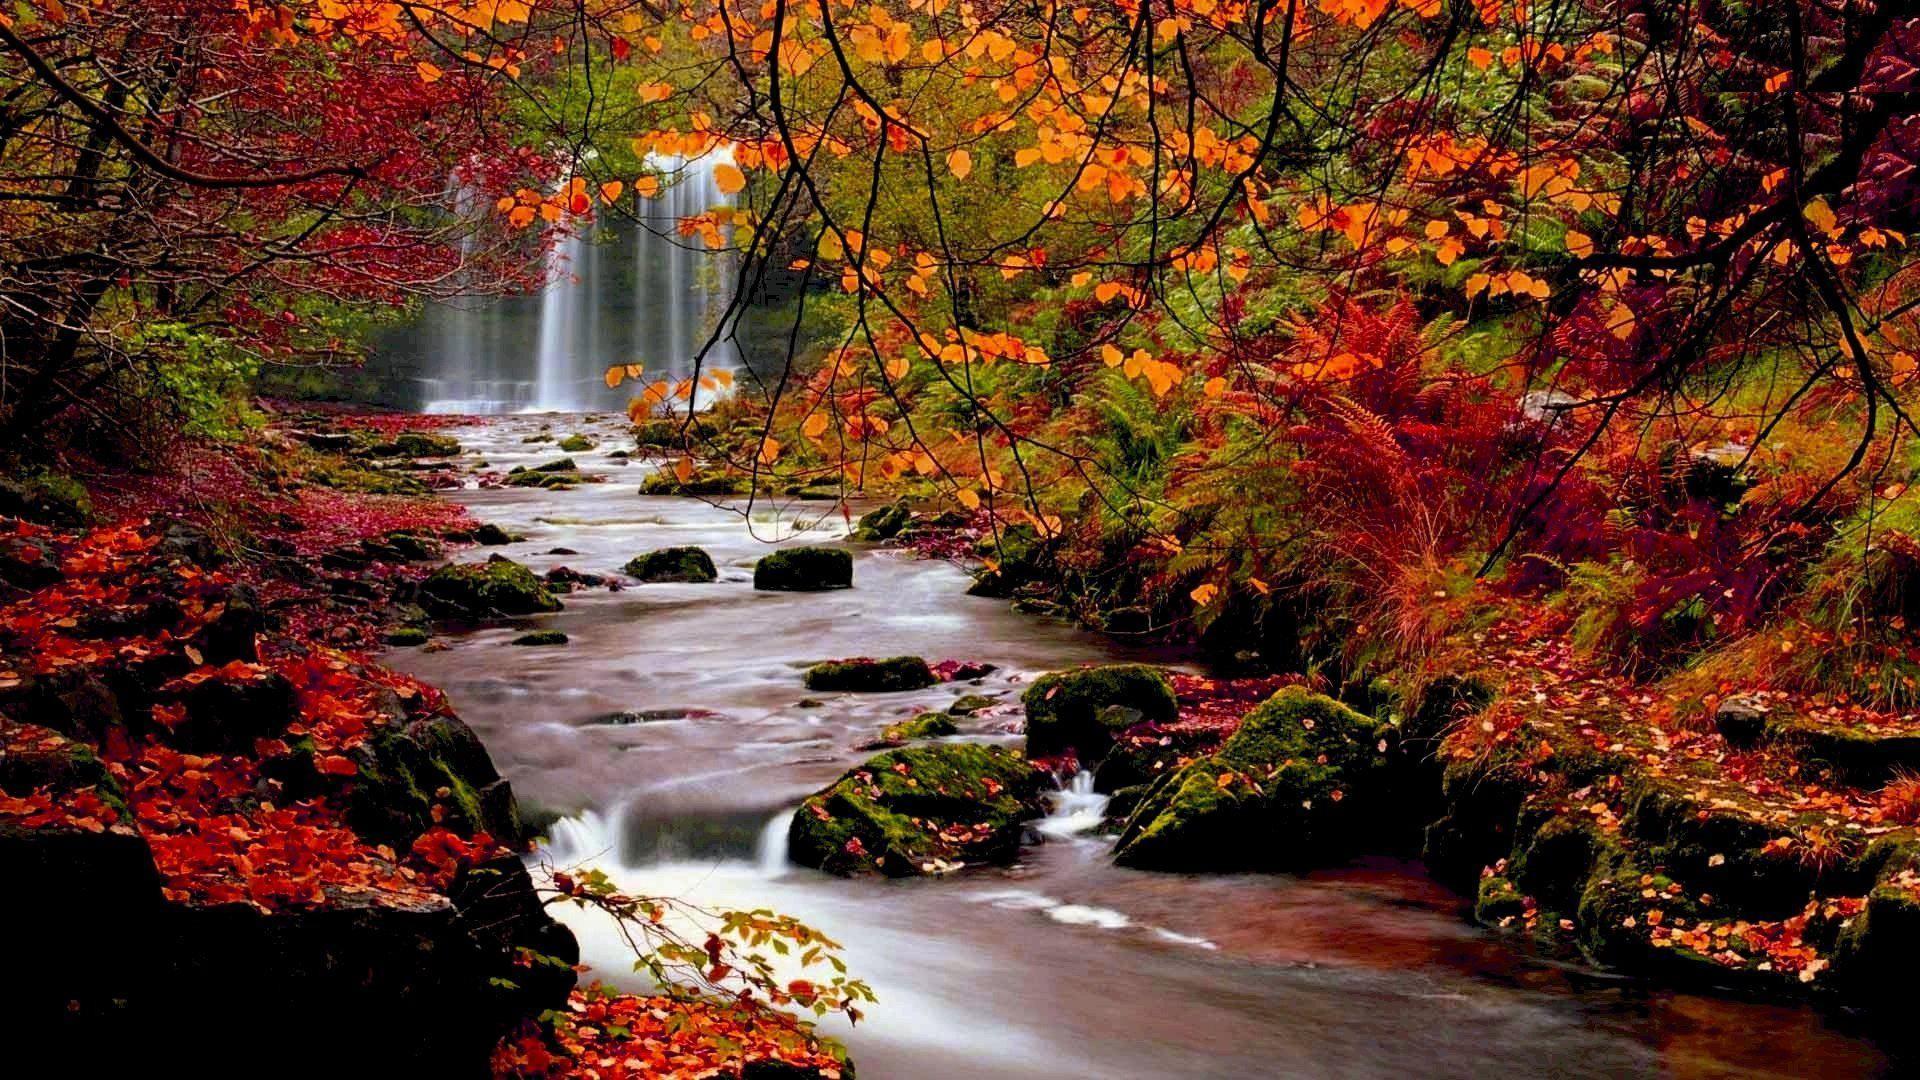 Fall Trees | Autumn Trees Nature Landscape Leaf Leaves Desktop Background  Images…